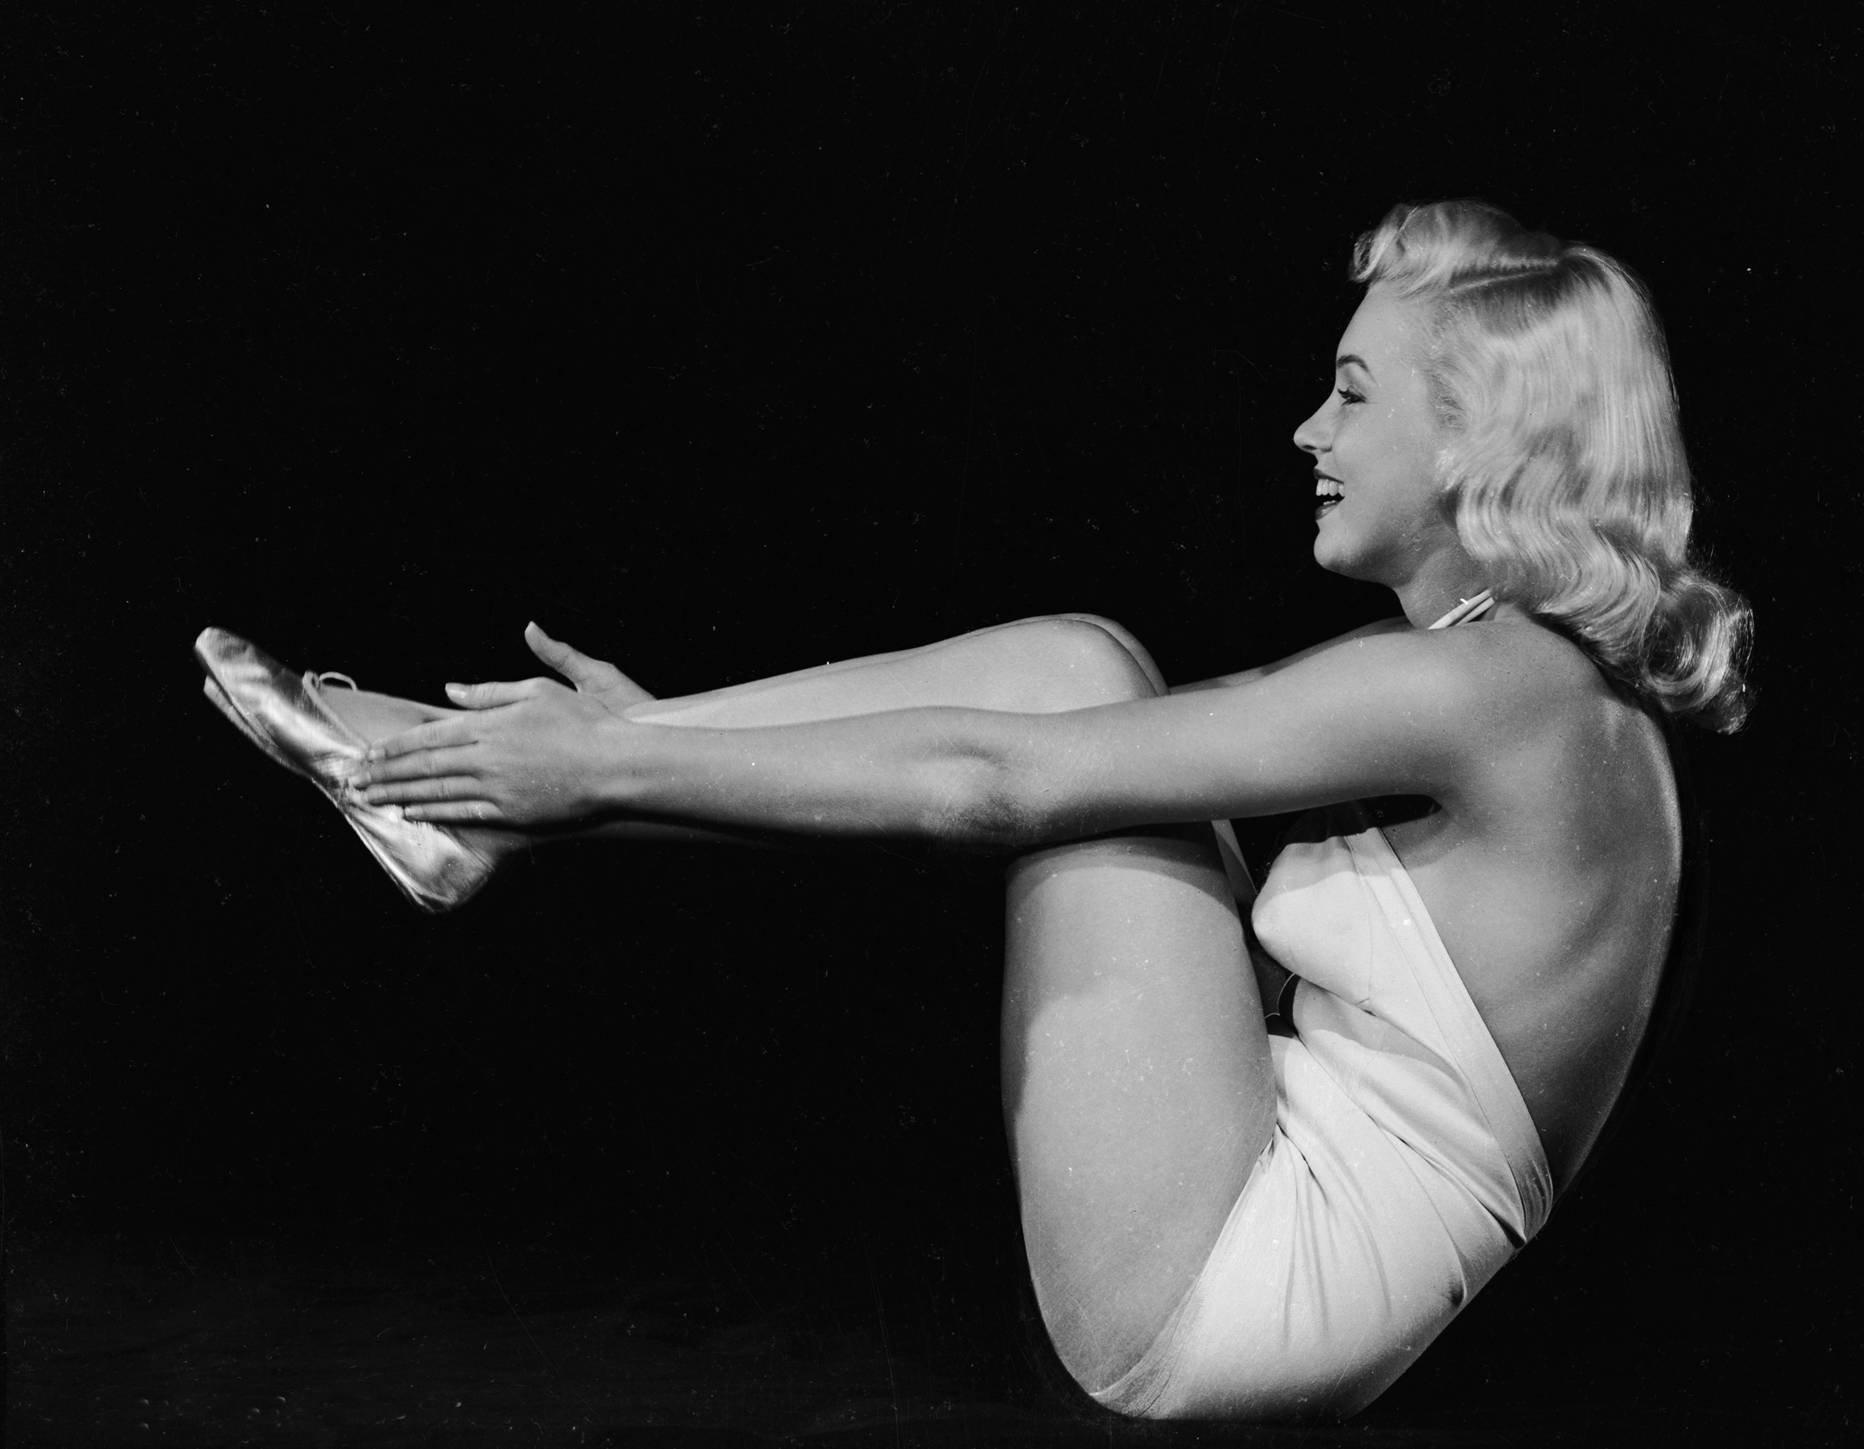 Marilyn Monroe Exercise Fitness Gym Model Photo Photo Art Pinup Girl Photos Artwork 8x10